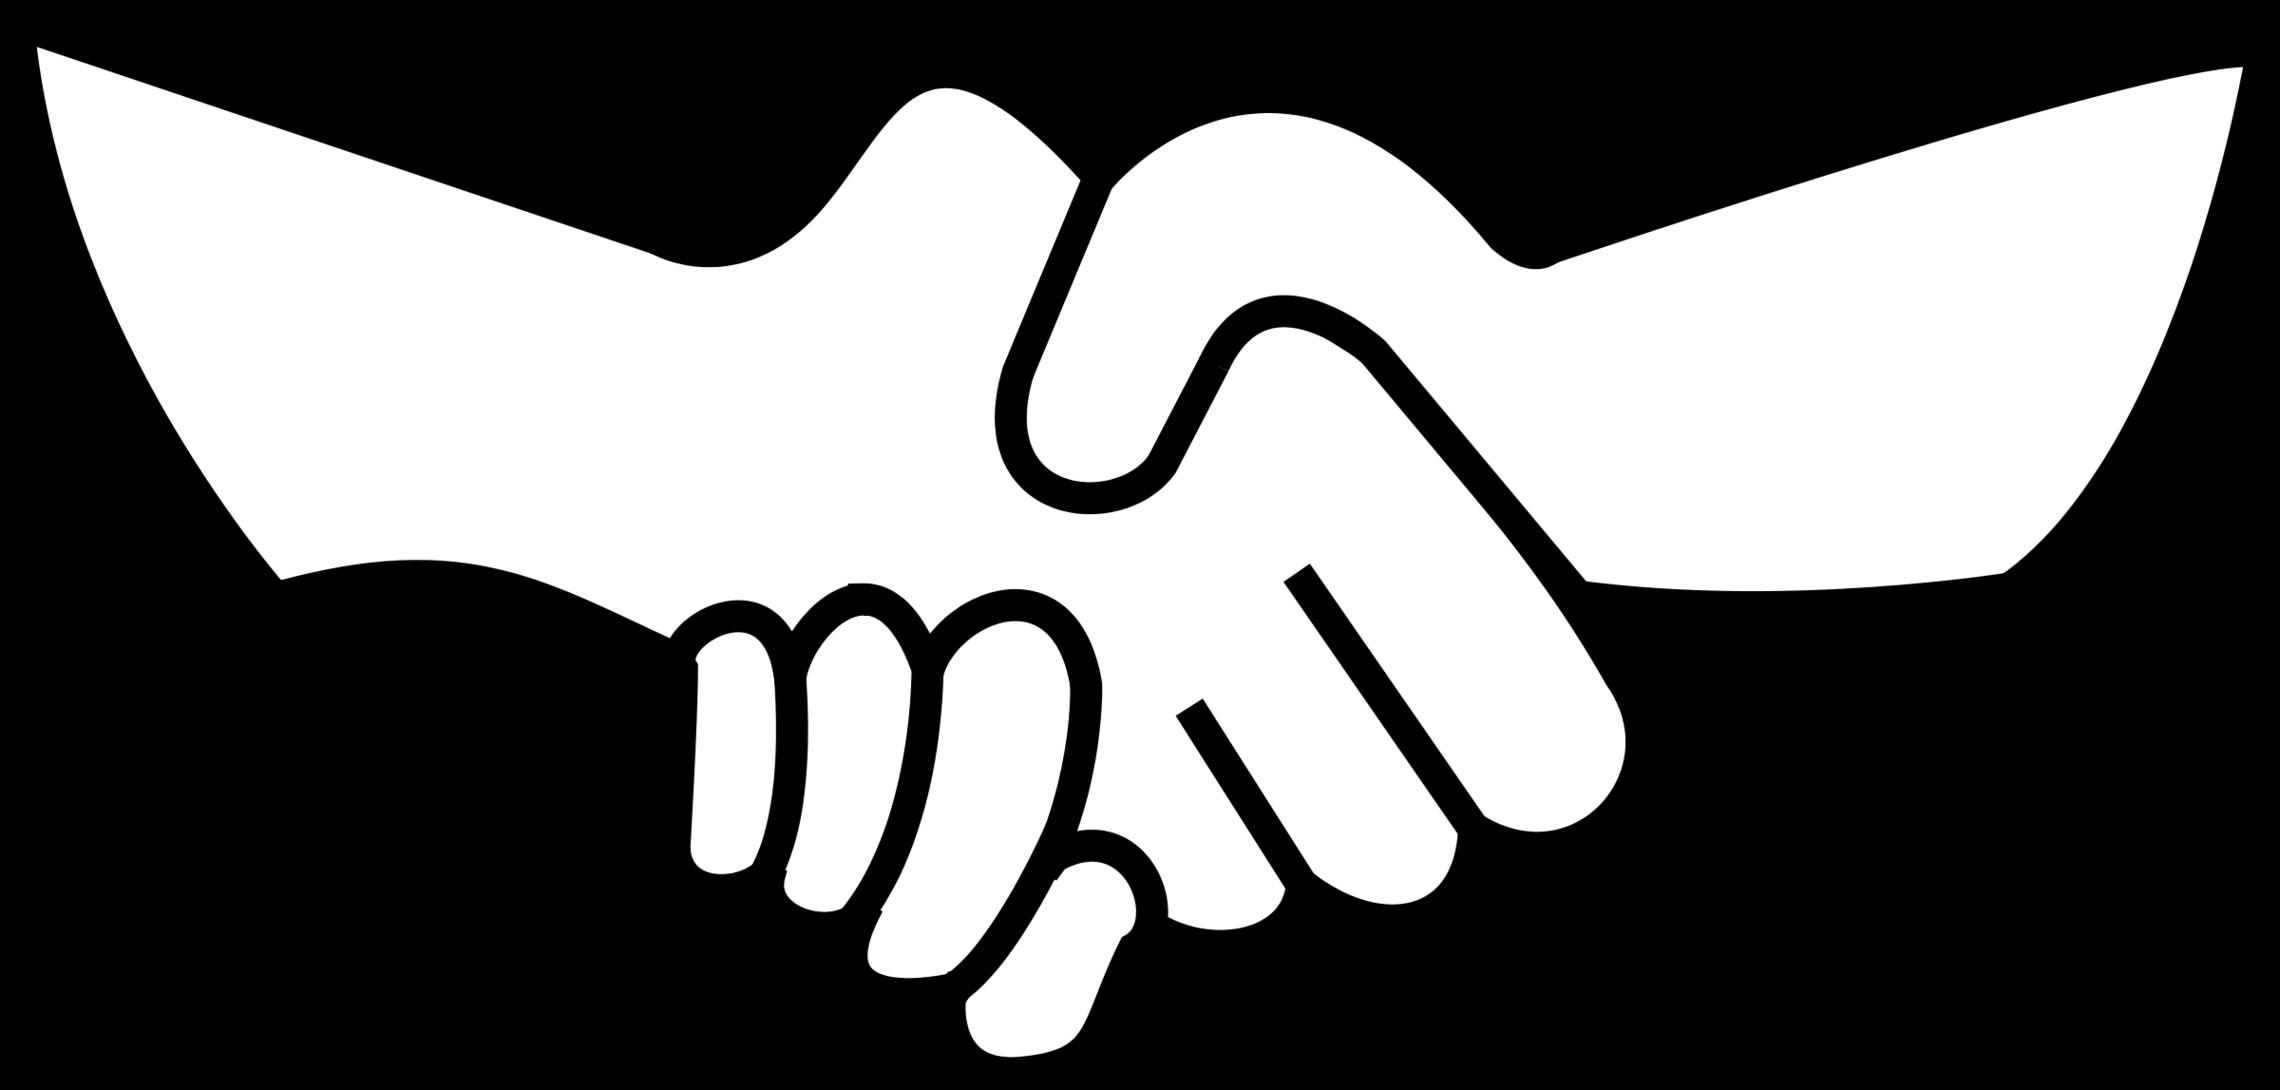 2280x1090 handshake clipart simple, handshake simple transparent free